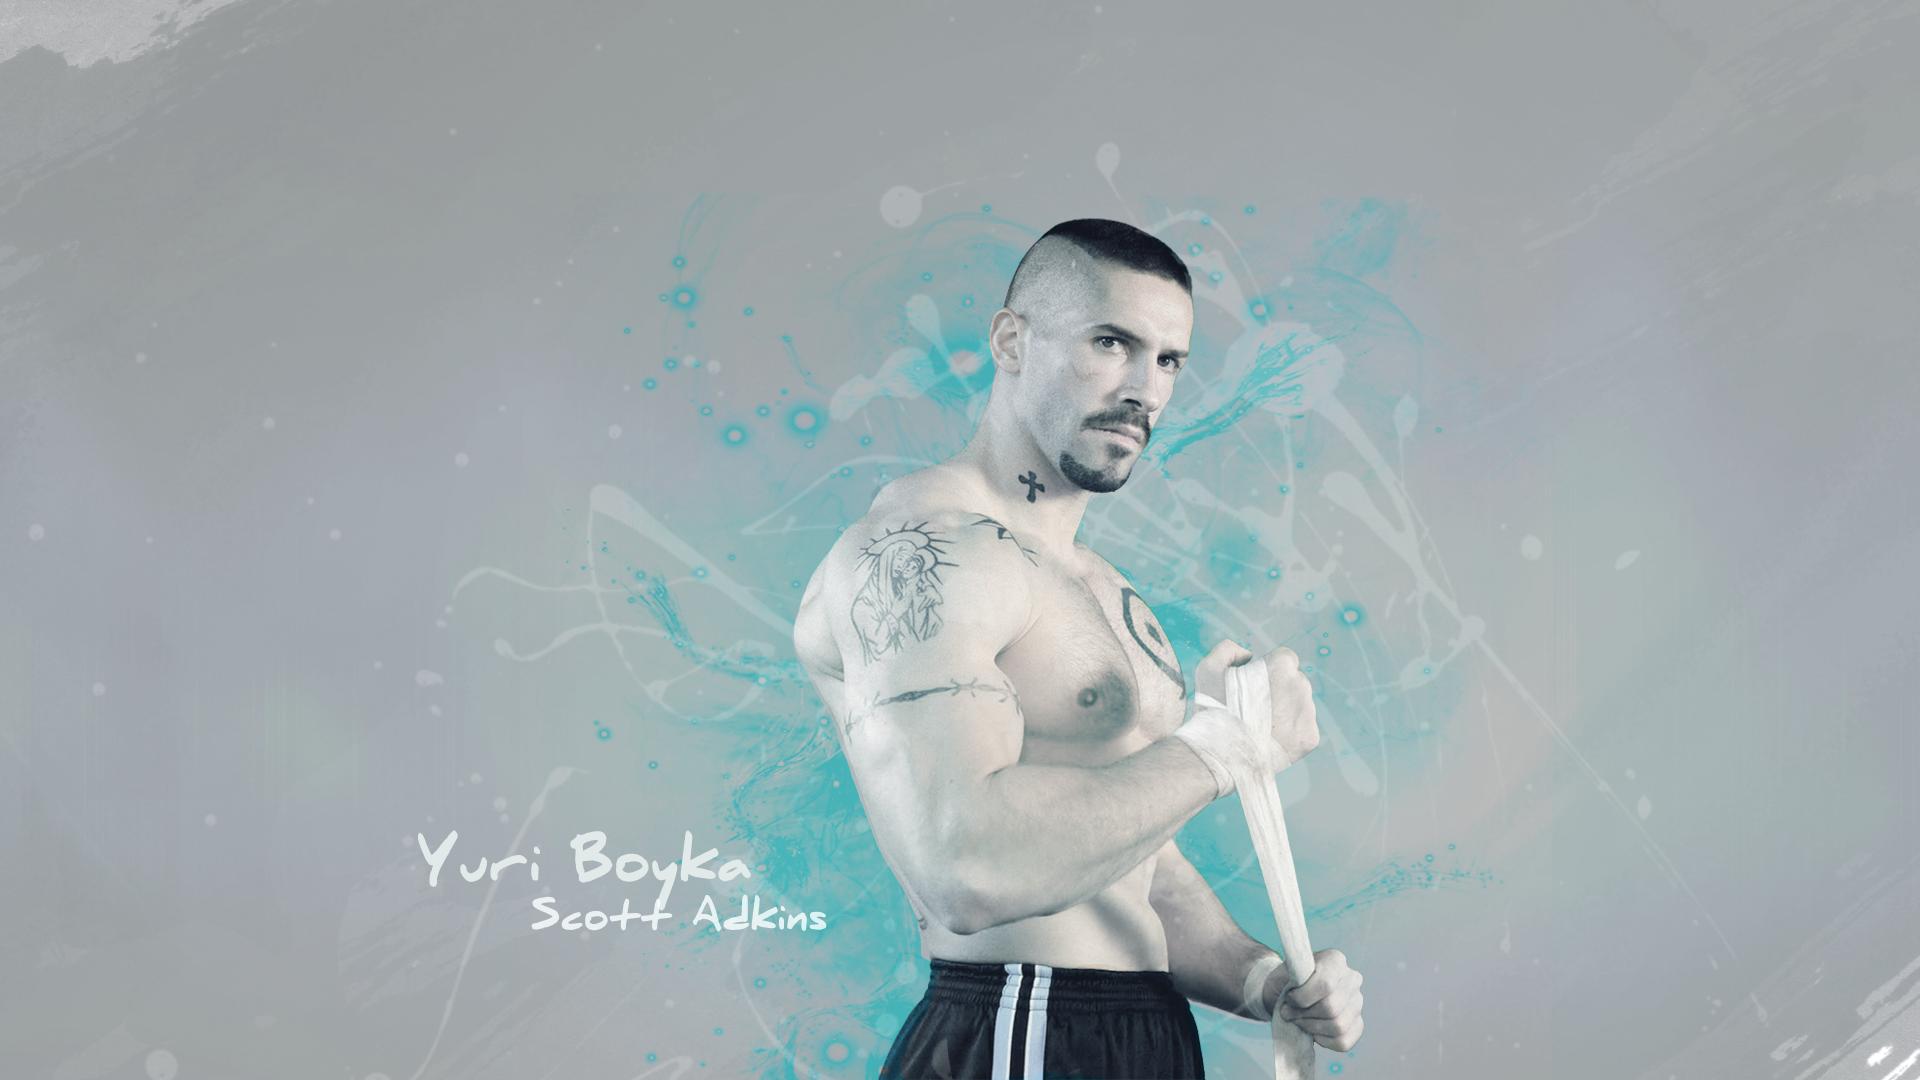 Hd wallpaper yuri boyka -  Yuri Boyka Scott Adkins By V4jgelica